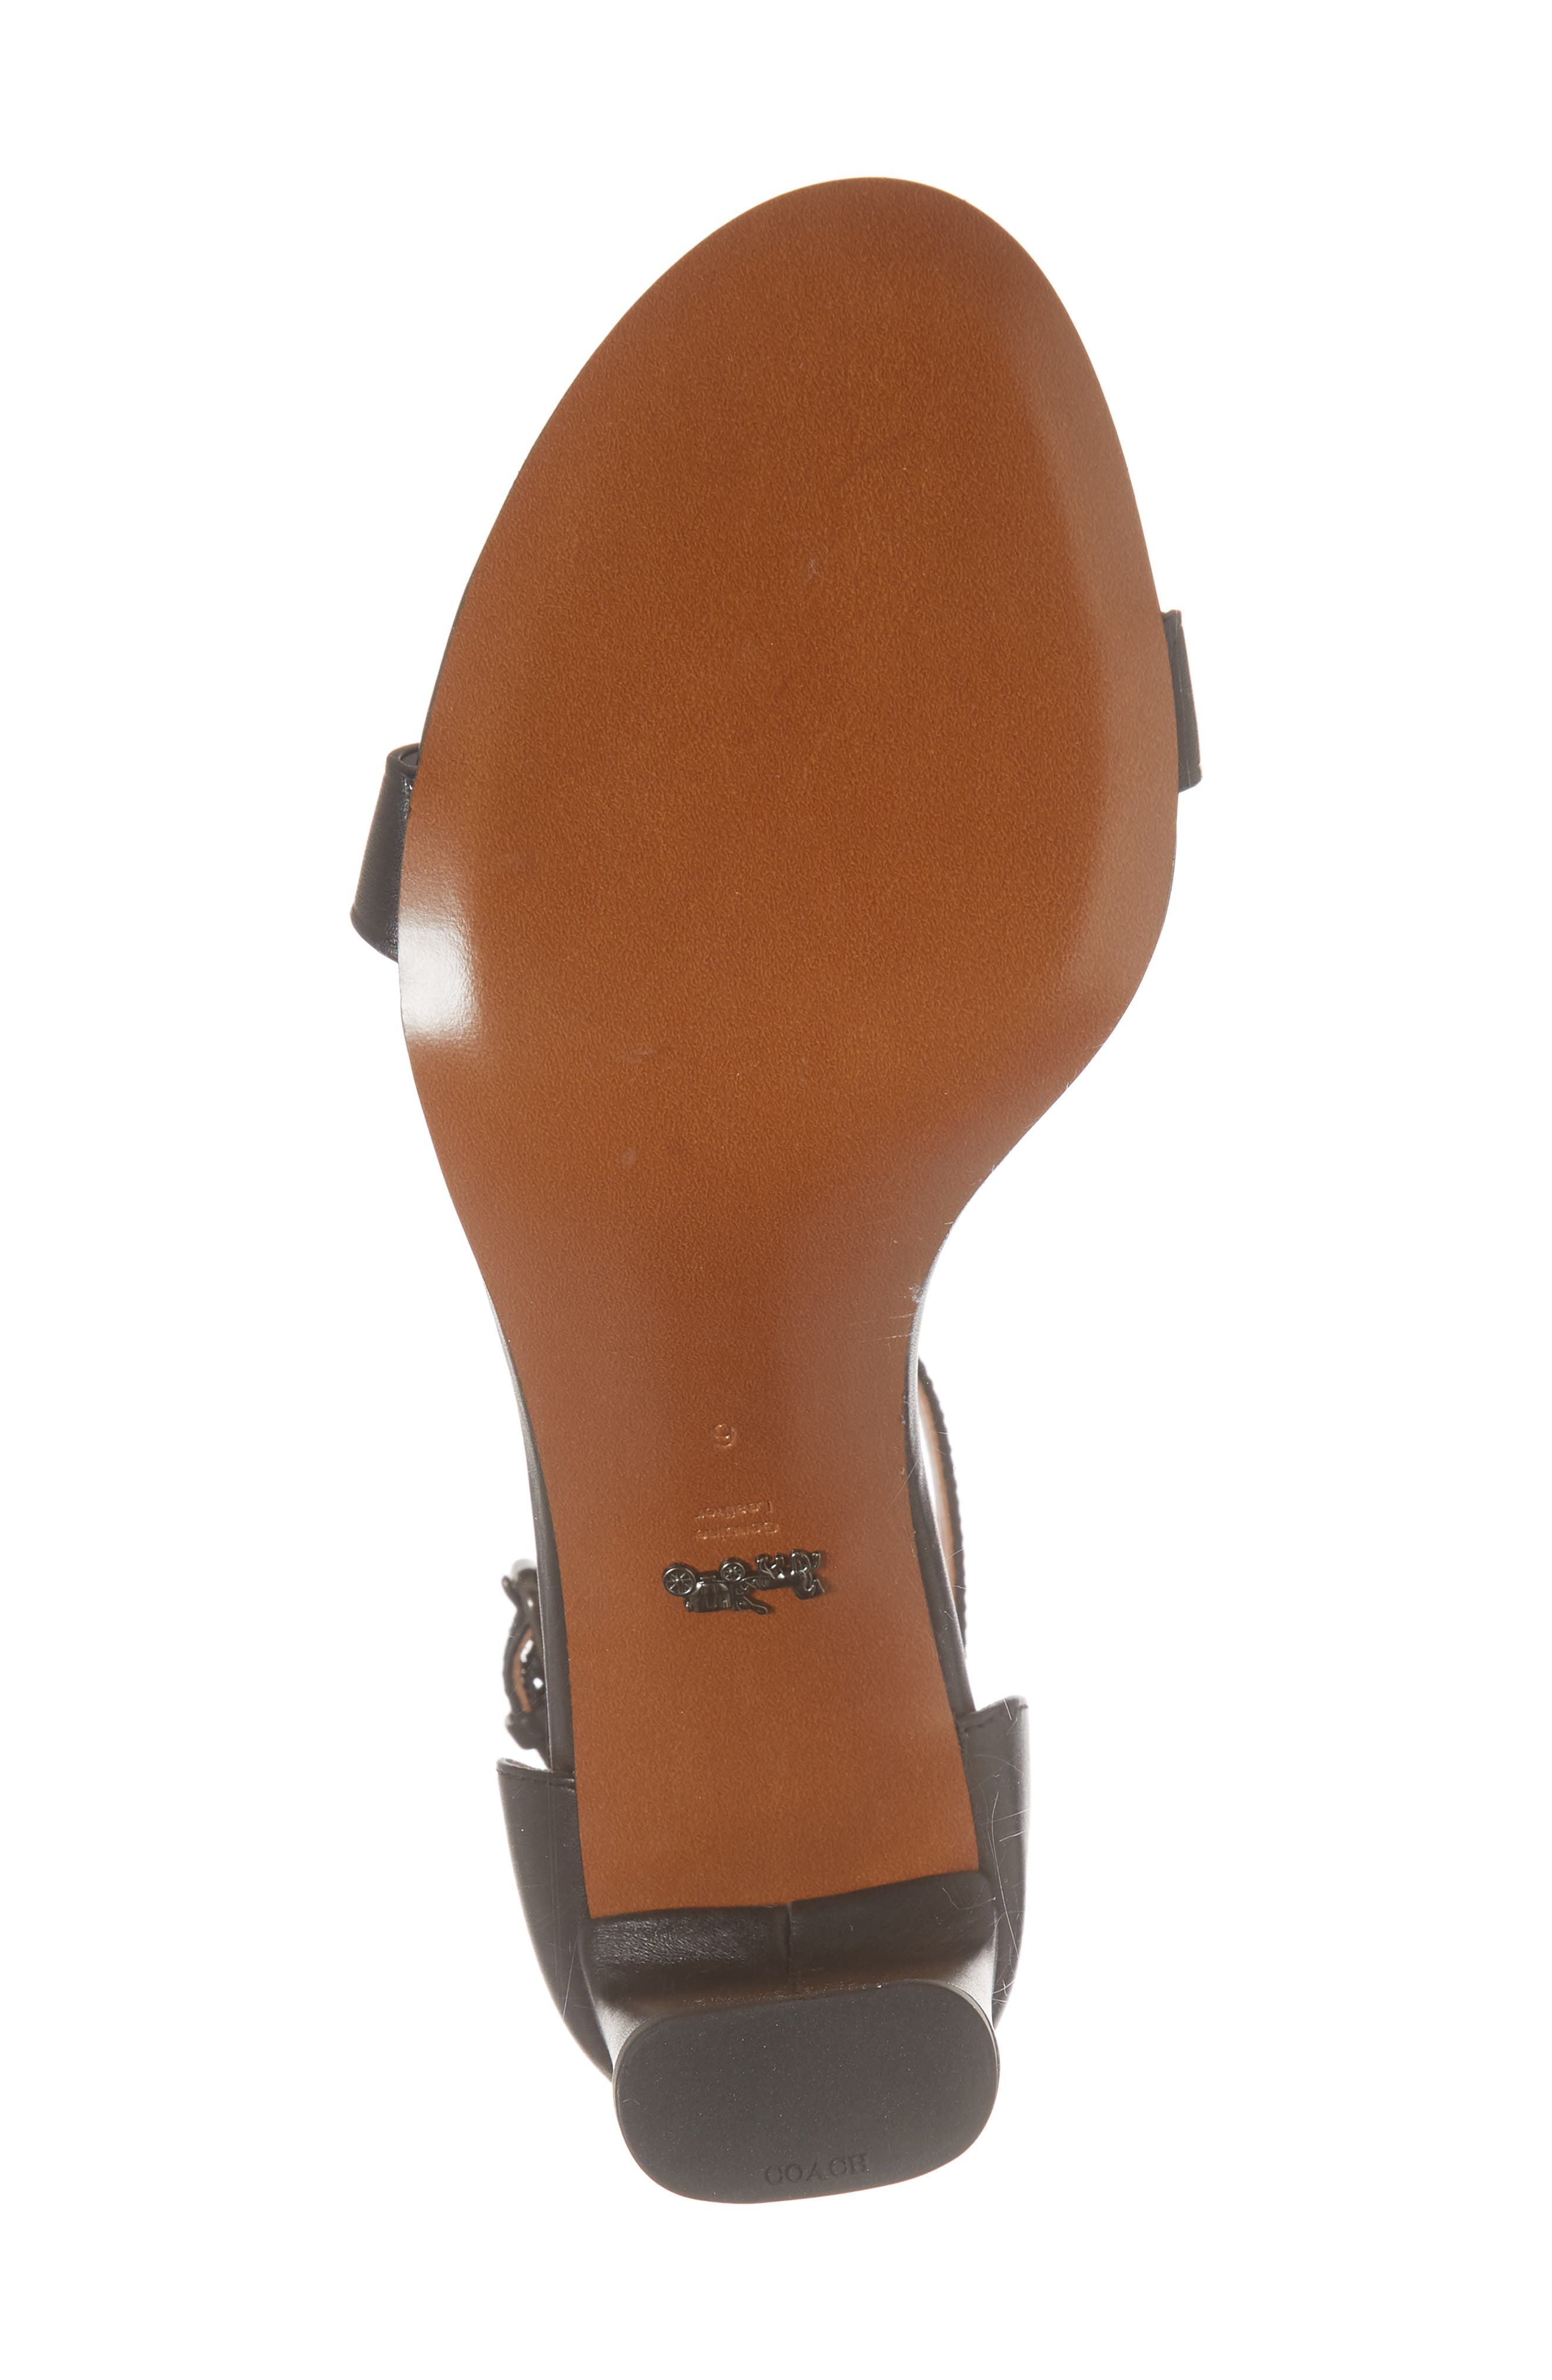 Link Ankle Strap Sandal,                             Alternate thumbnail 6, color,                             Black Leather